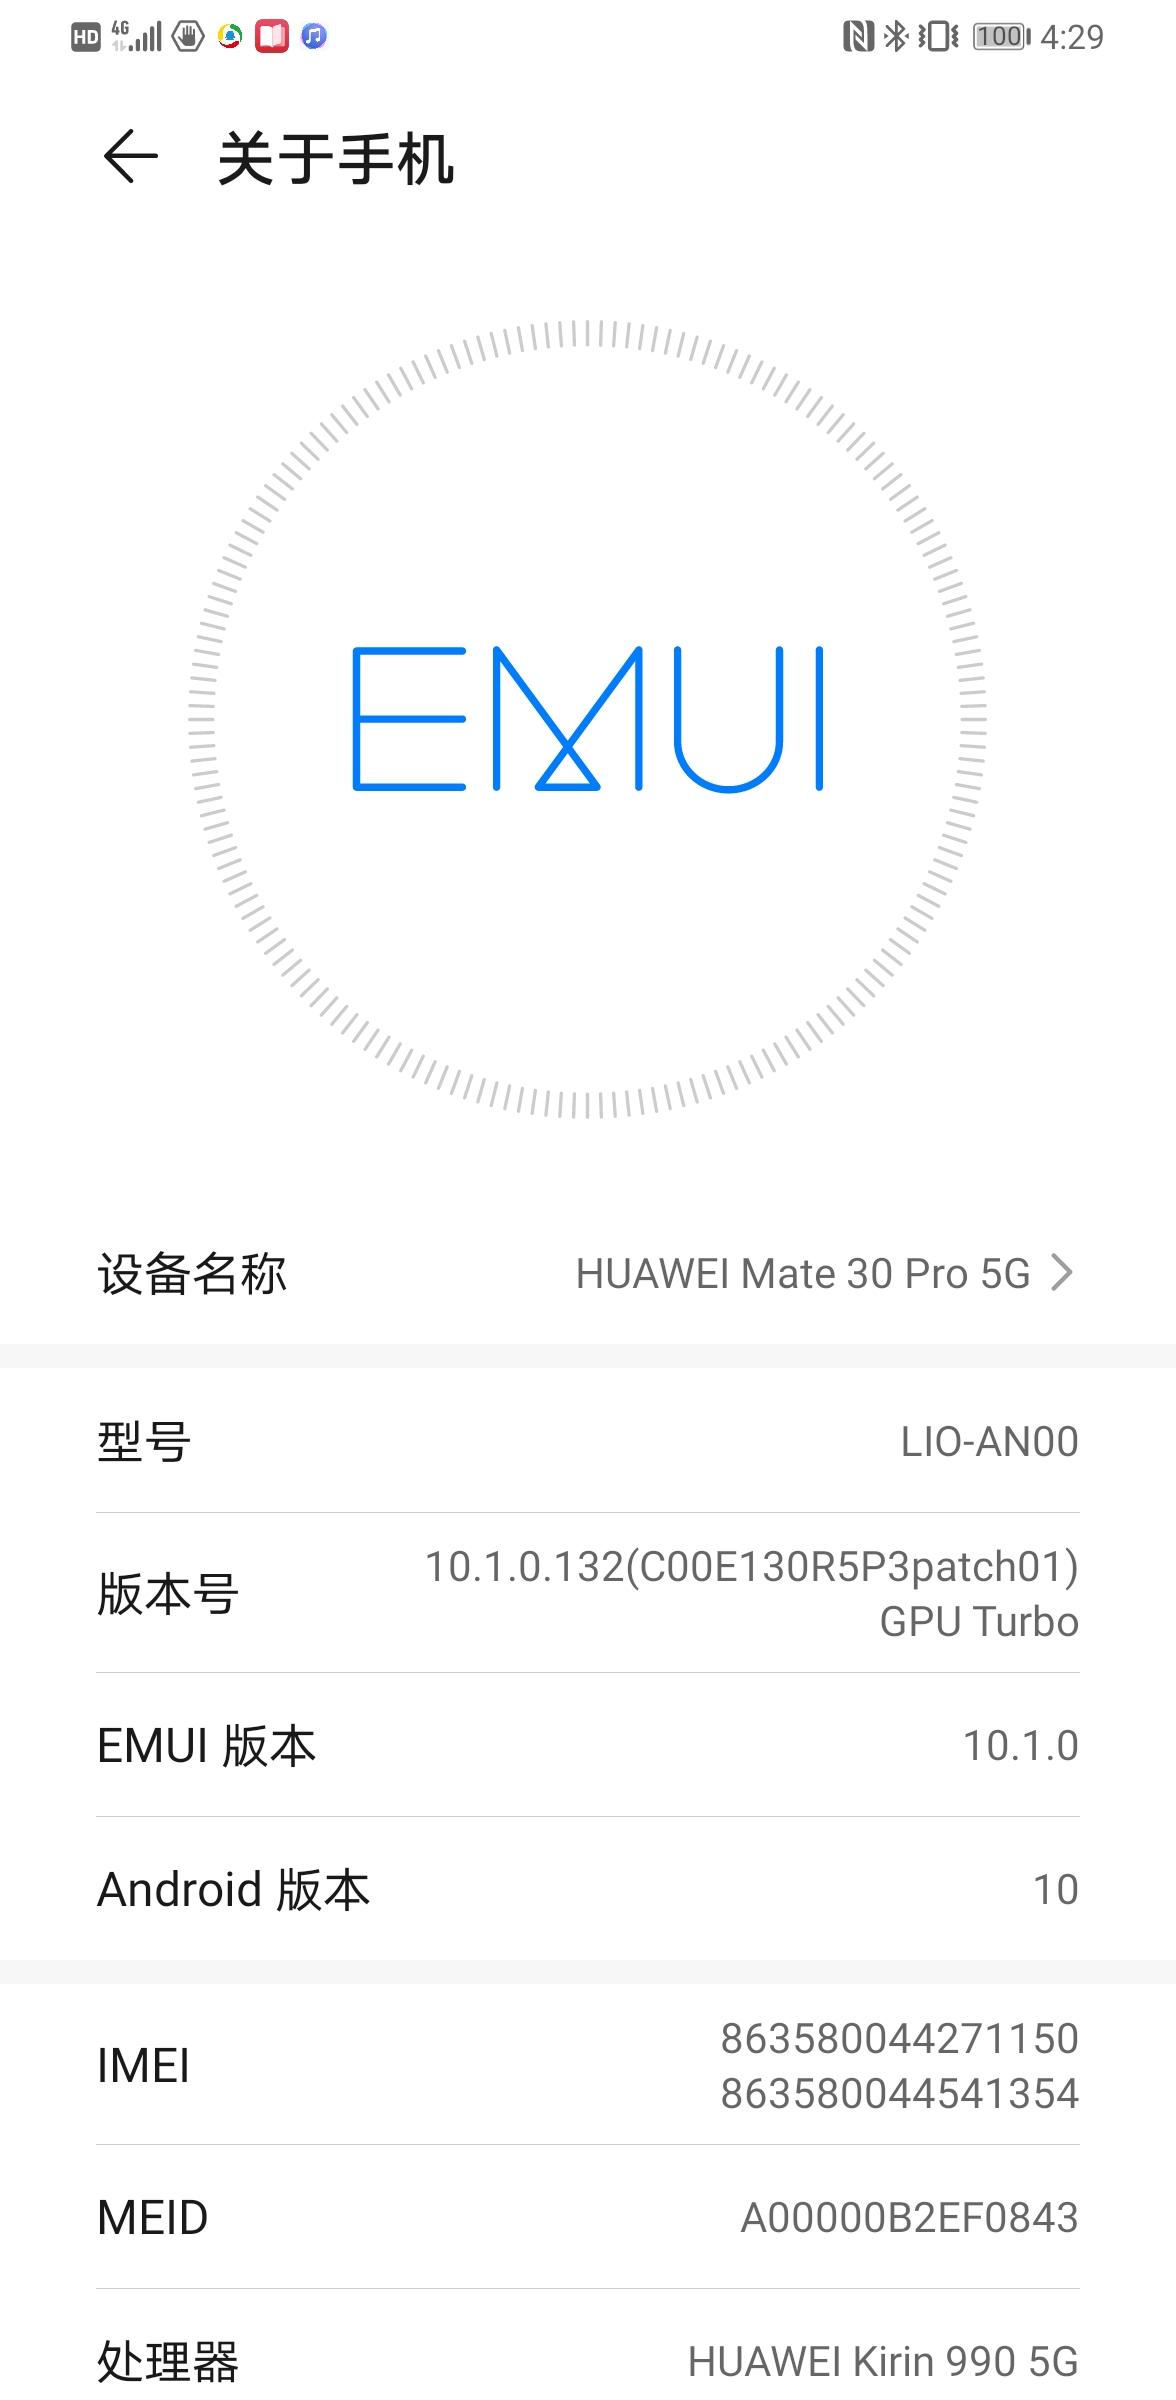 Screenshot_20200519_162947_com.android.settings.jpg